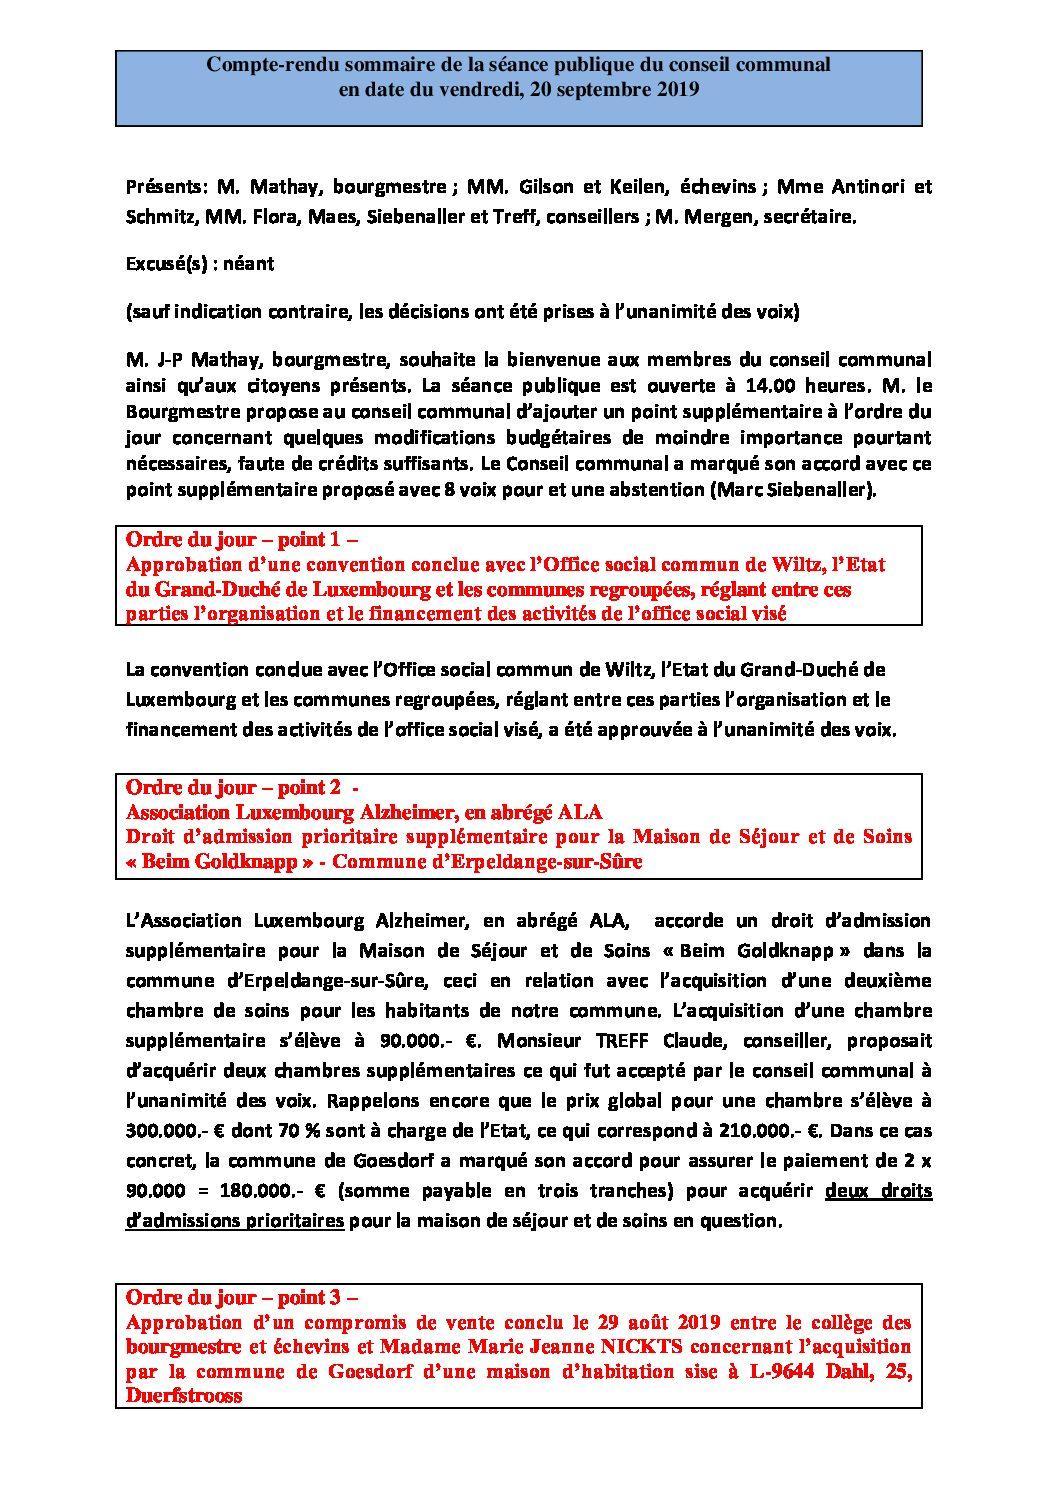 Rapport-Conseil communal 20-09-2019